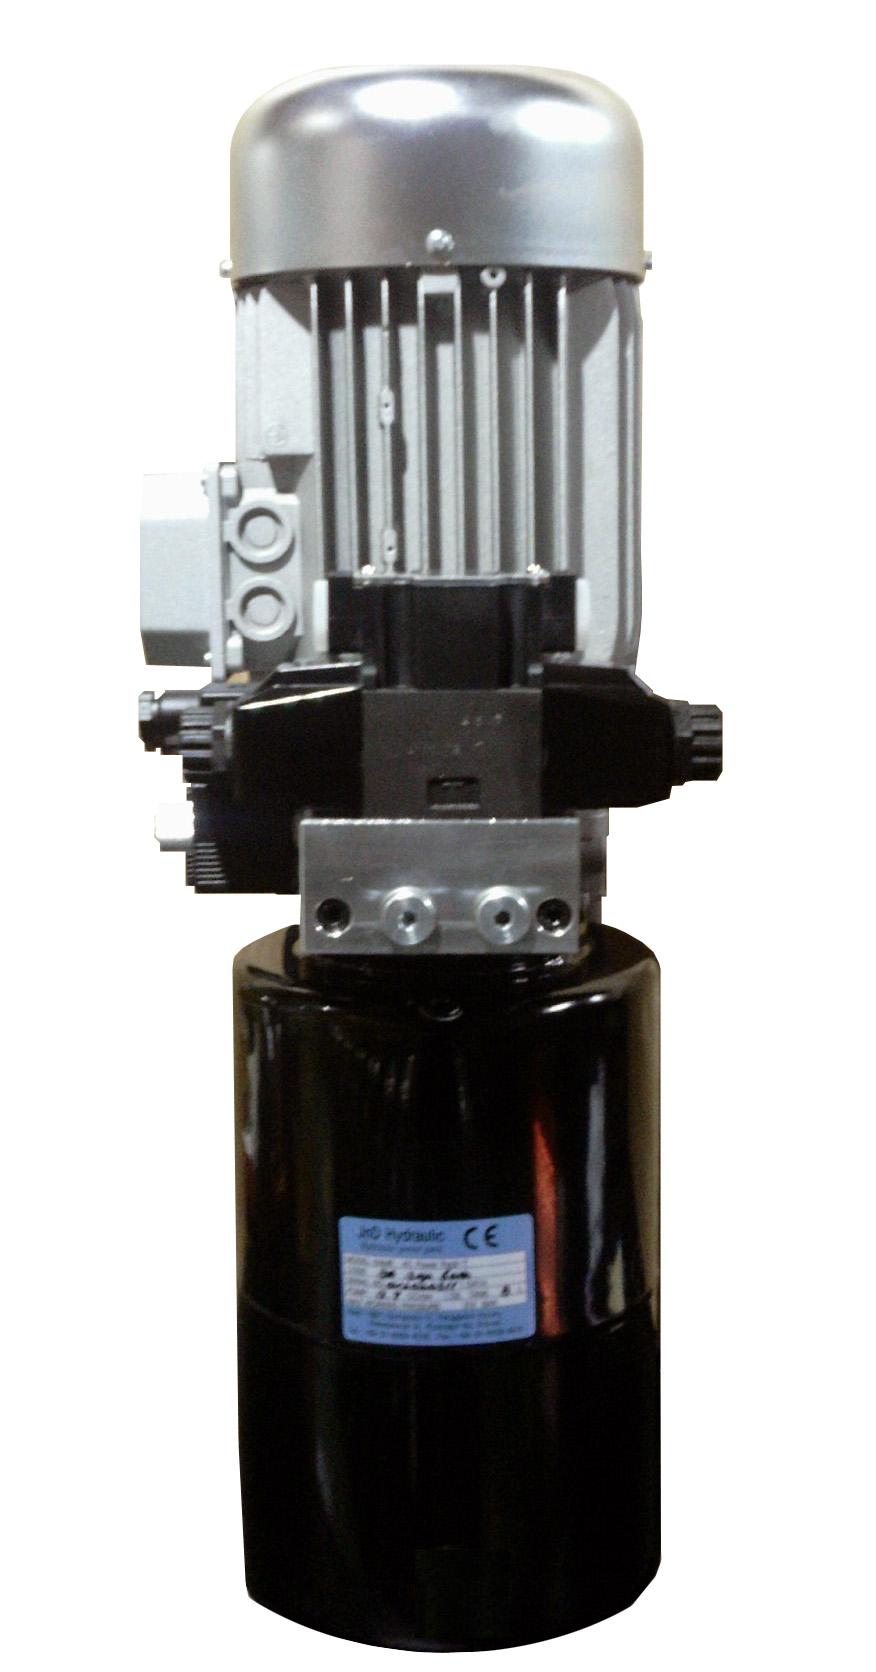 online store f2824 163d4 AC HYDRAULIC POWER PACK - Dock Leveler - JND HYDRAULICS CO., Ltd ...